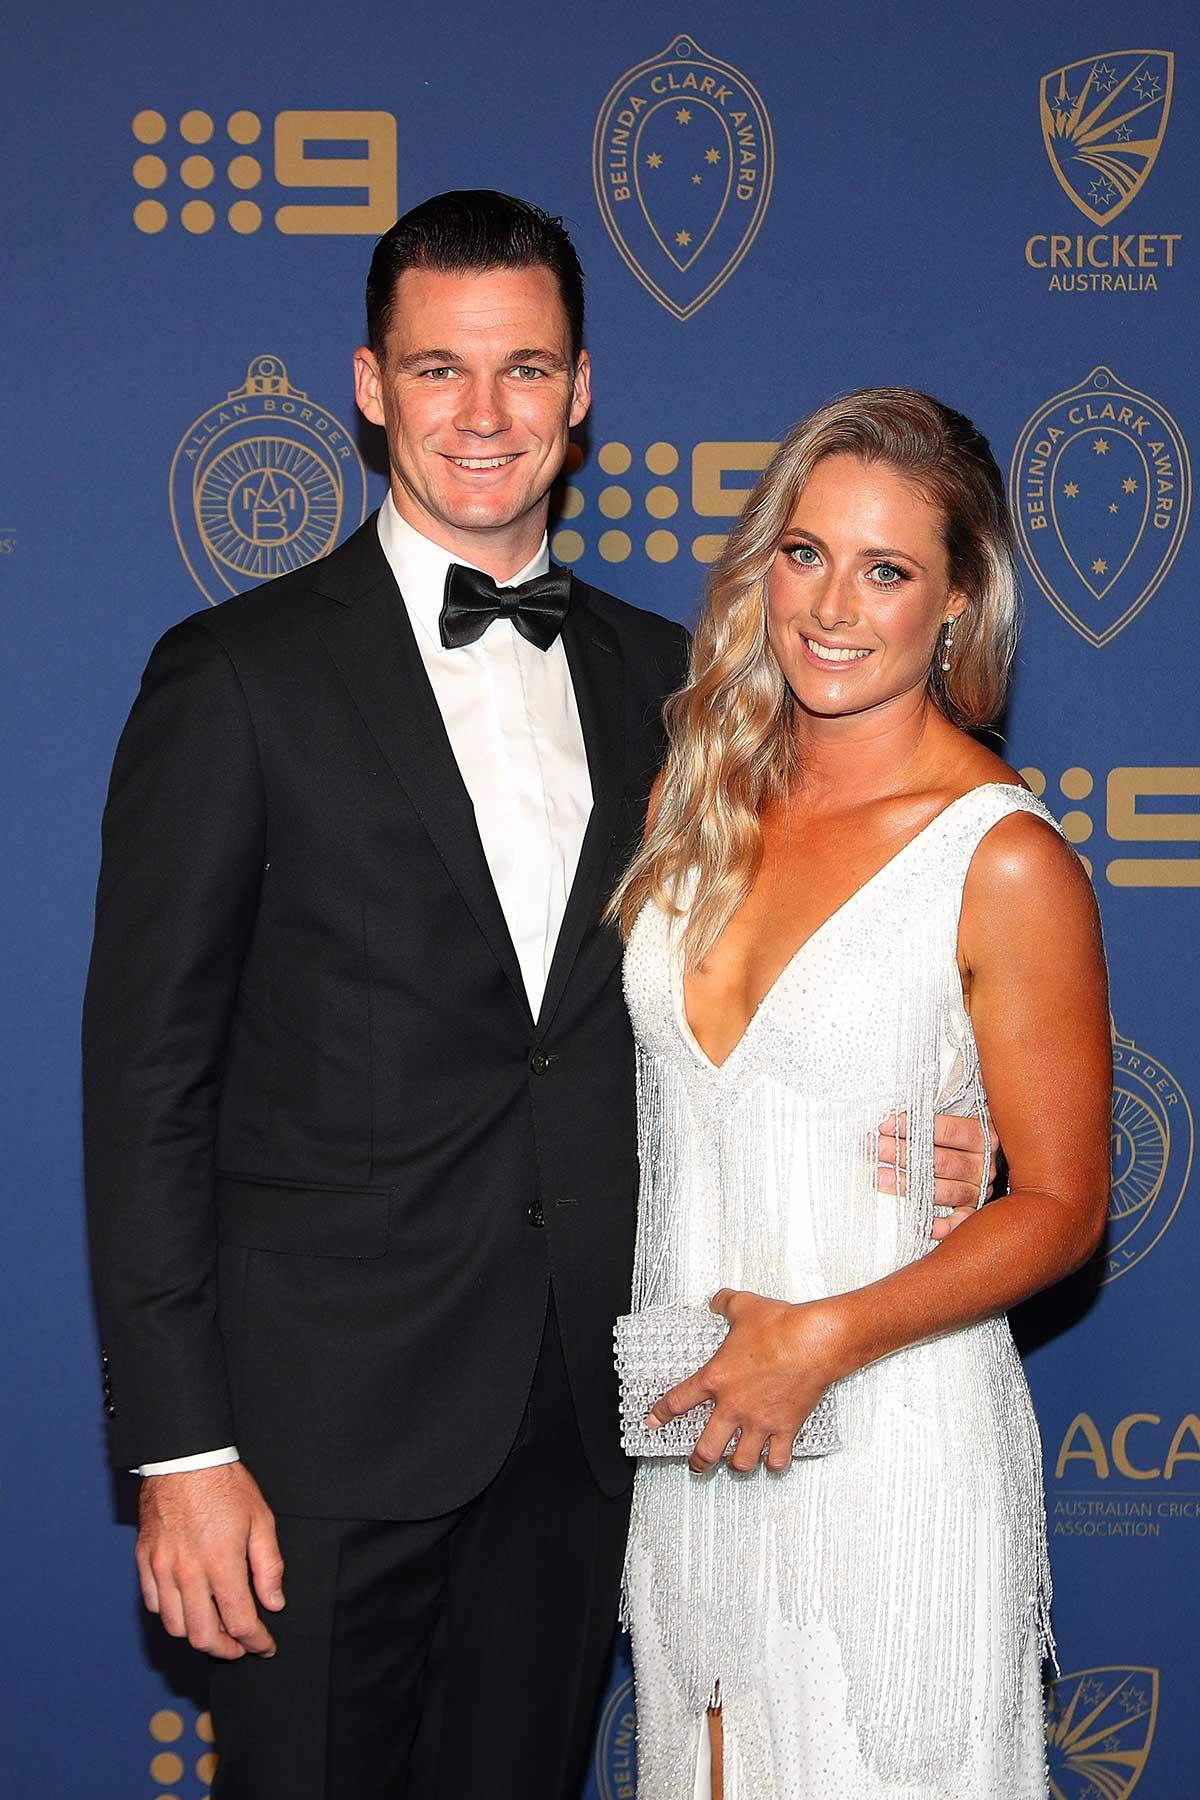 Test batsman Peter Handscomb and Sarah Ray // Getty